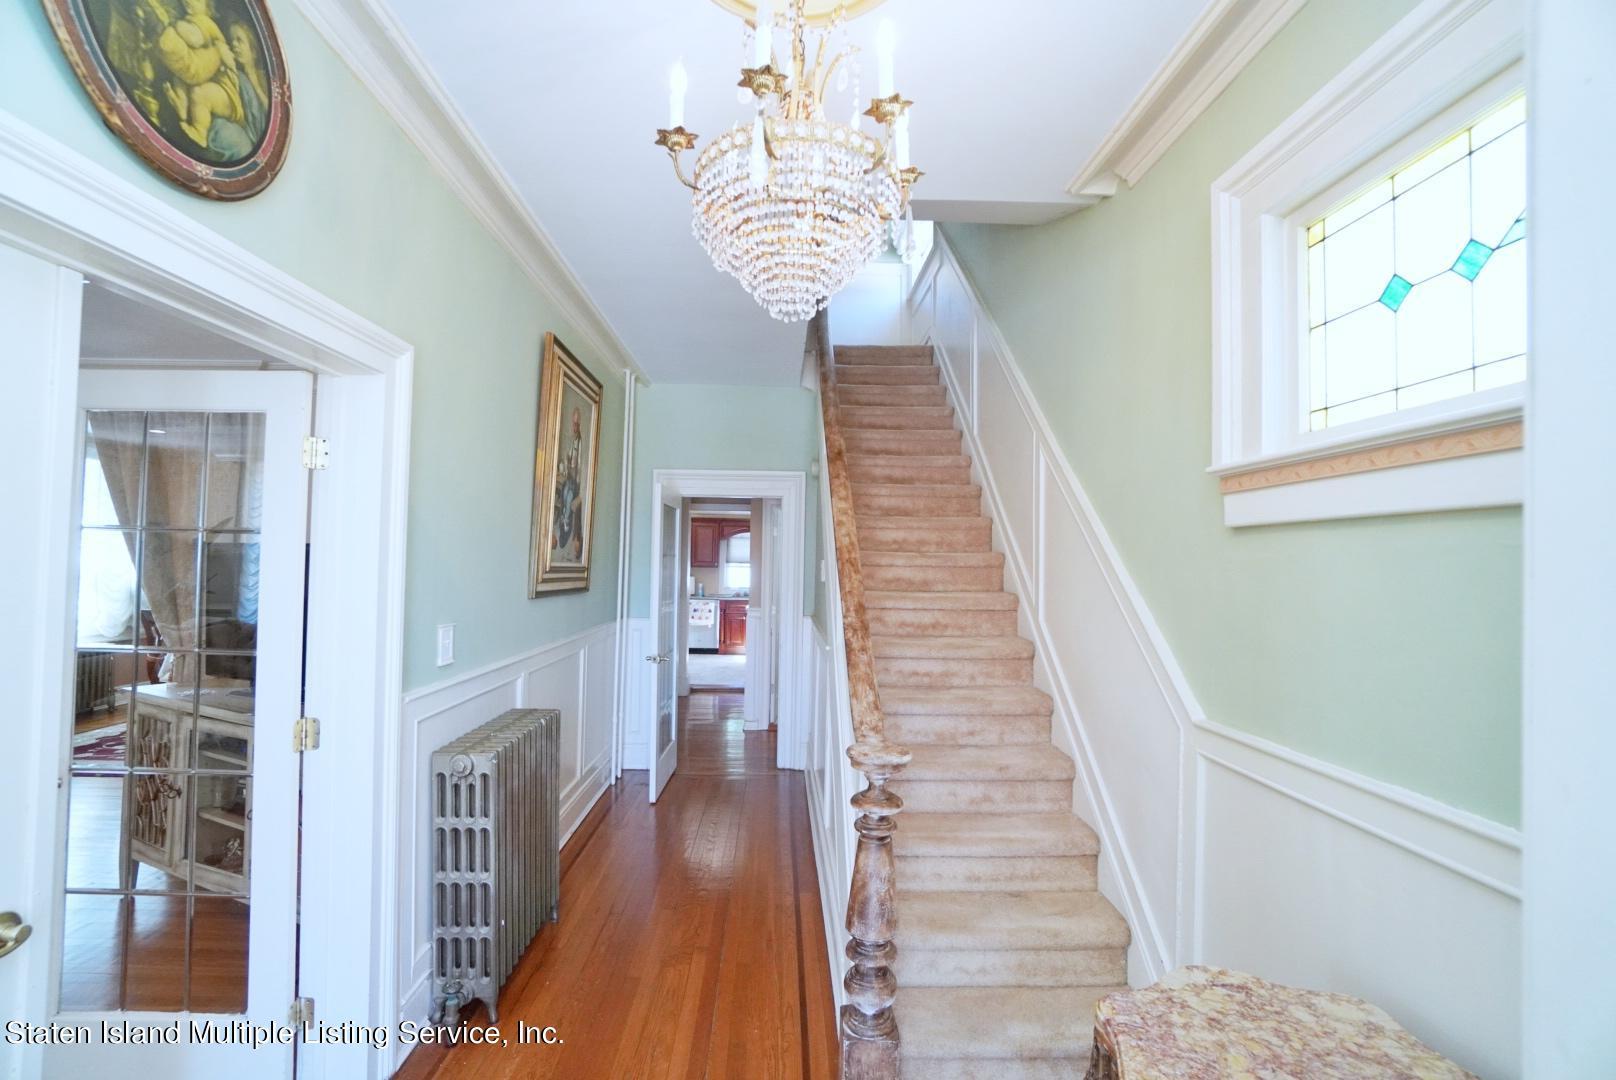 Single Family - Detached 264 Fisher Avenue  Staten Island, NY 10307, MLS-1146898-6